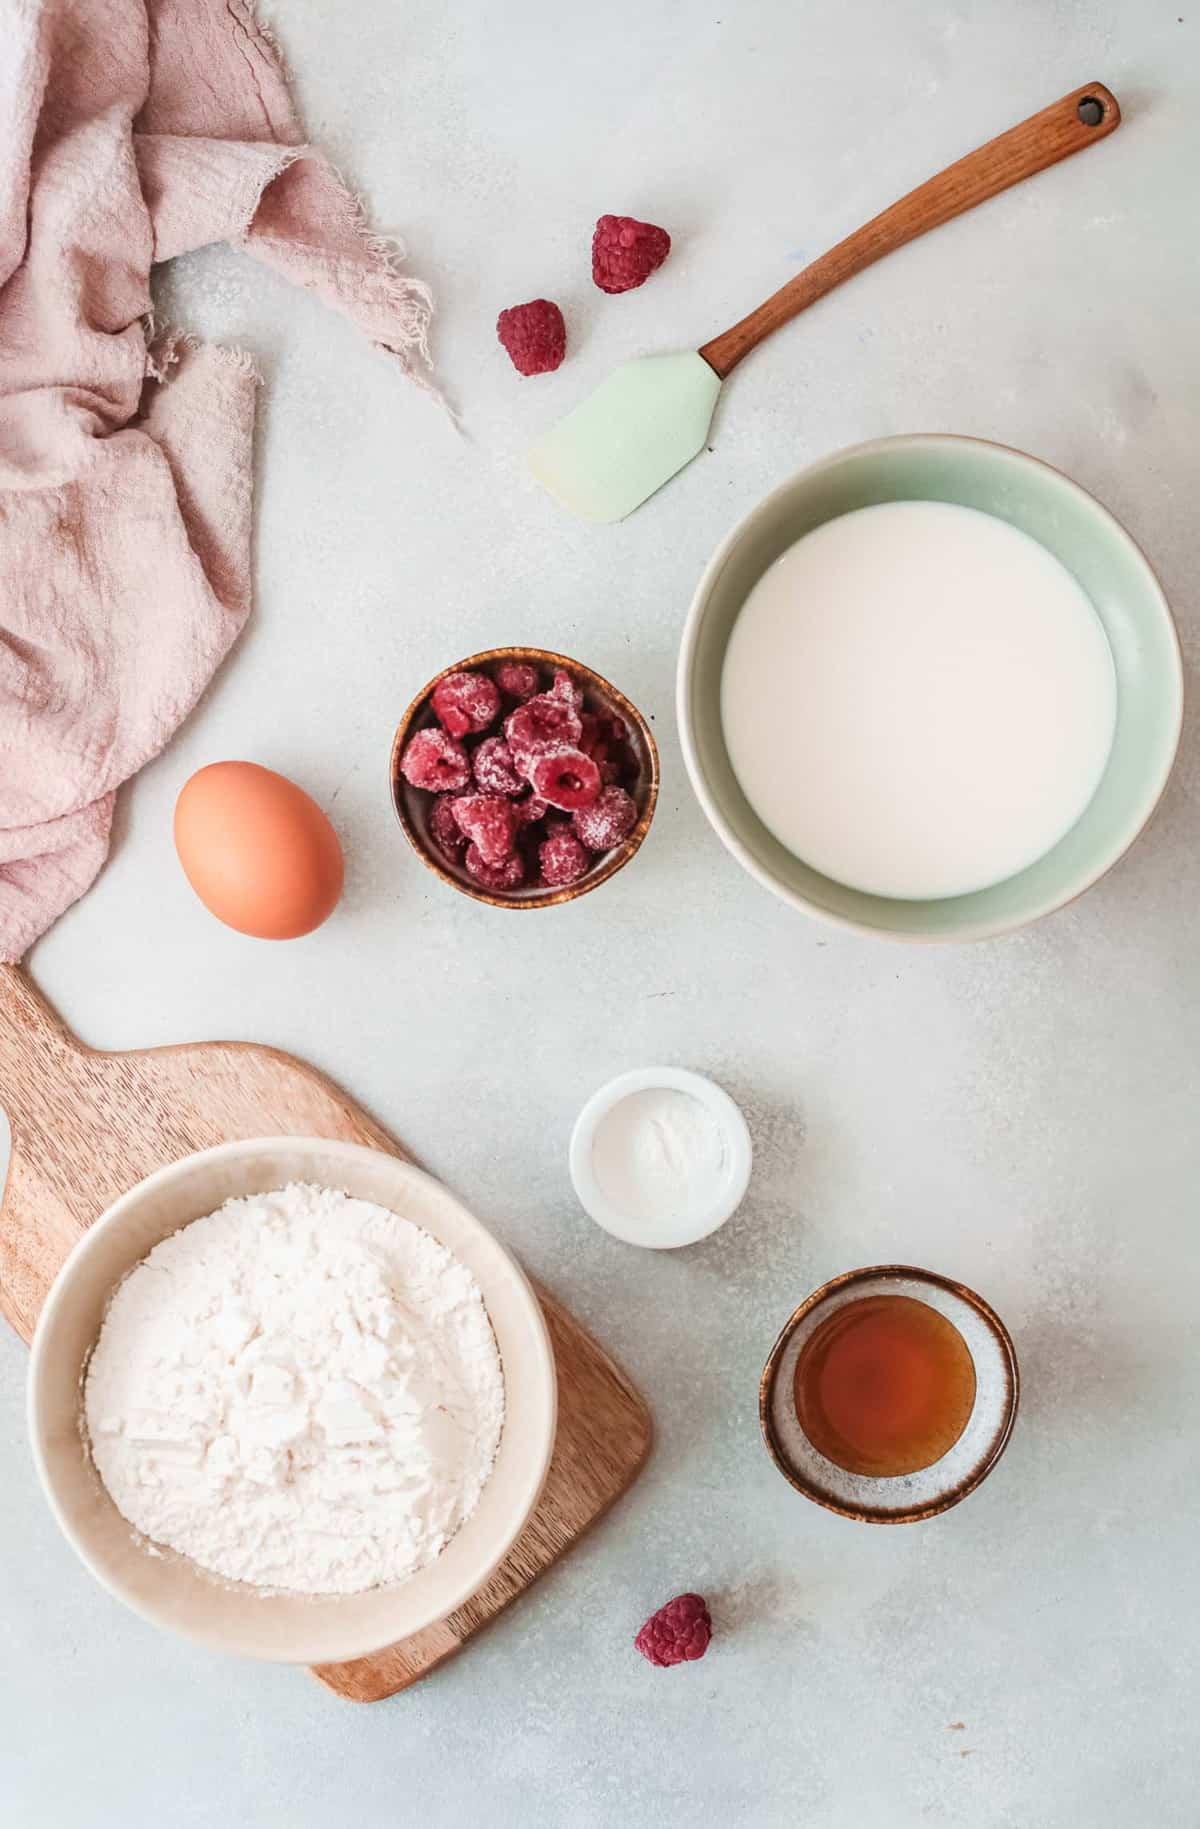 Overhead view of ingredients in separate bowls.